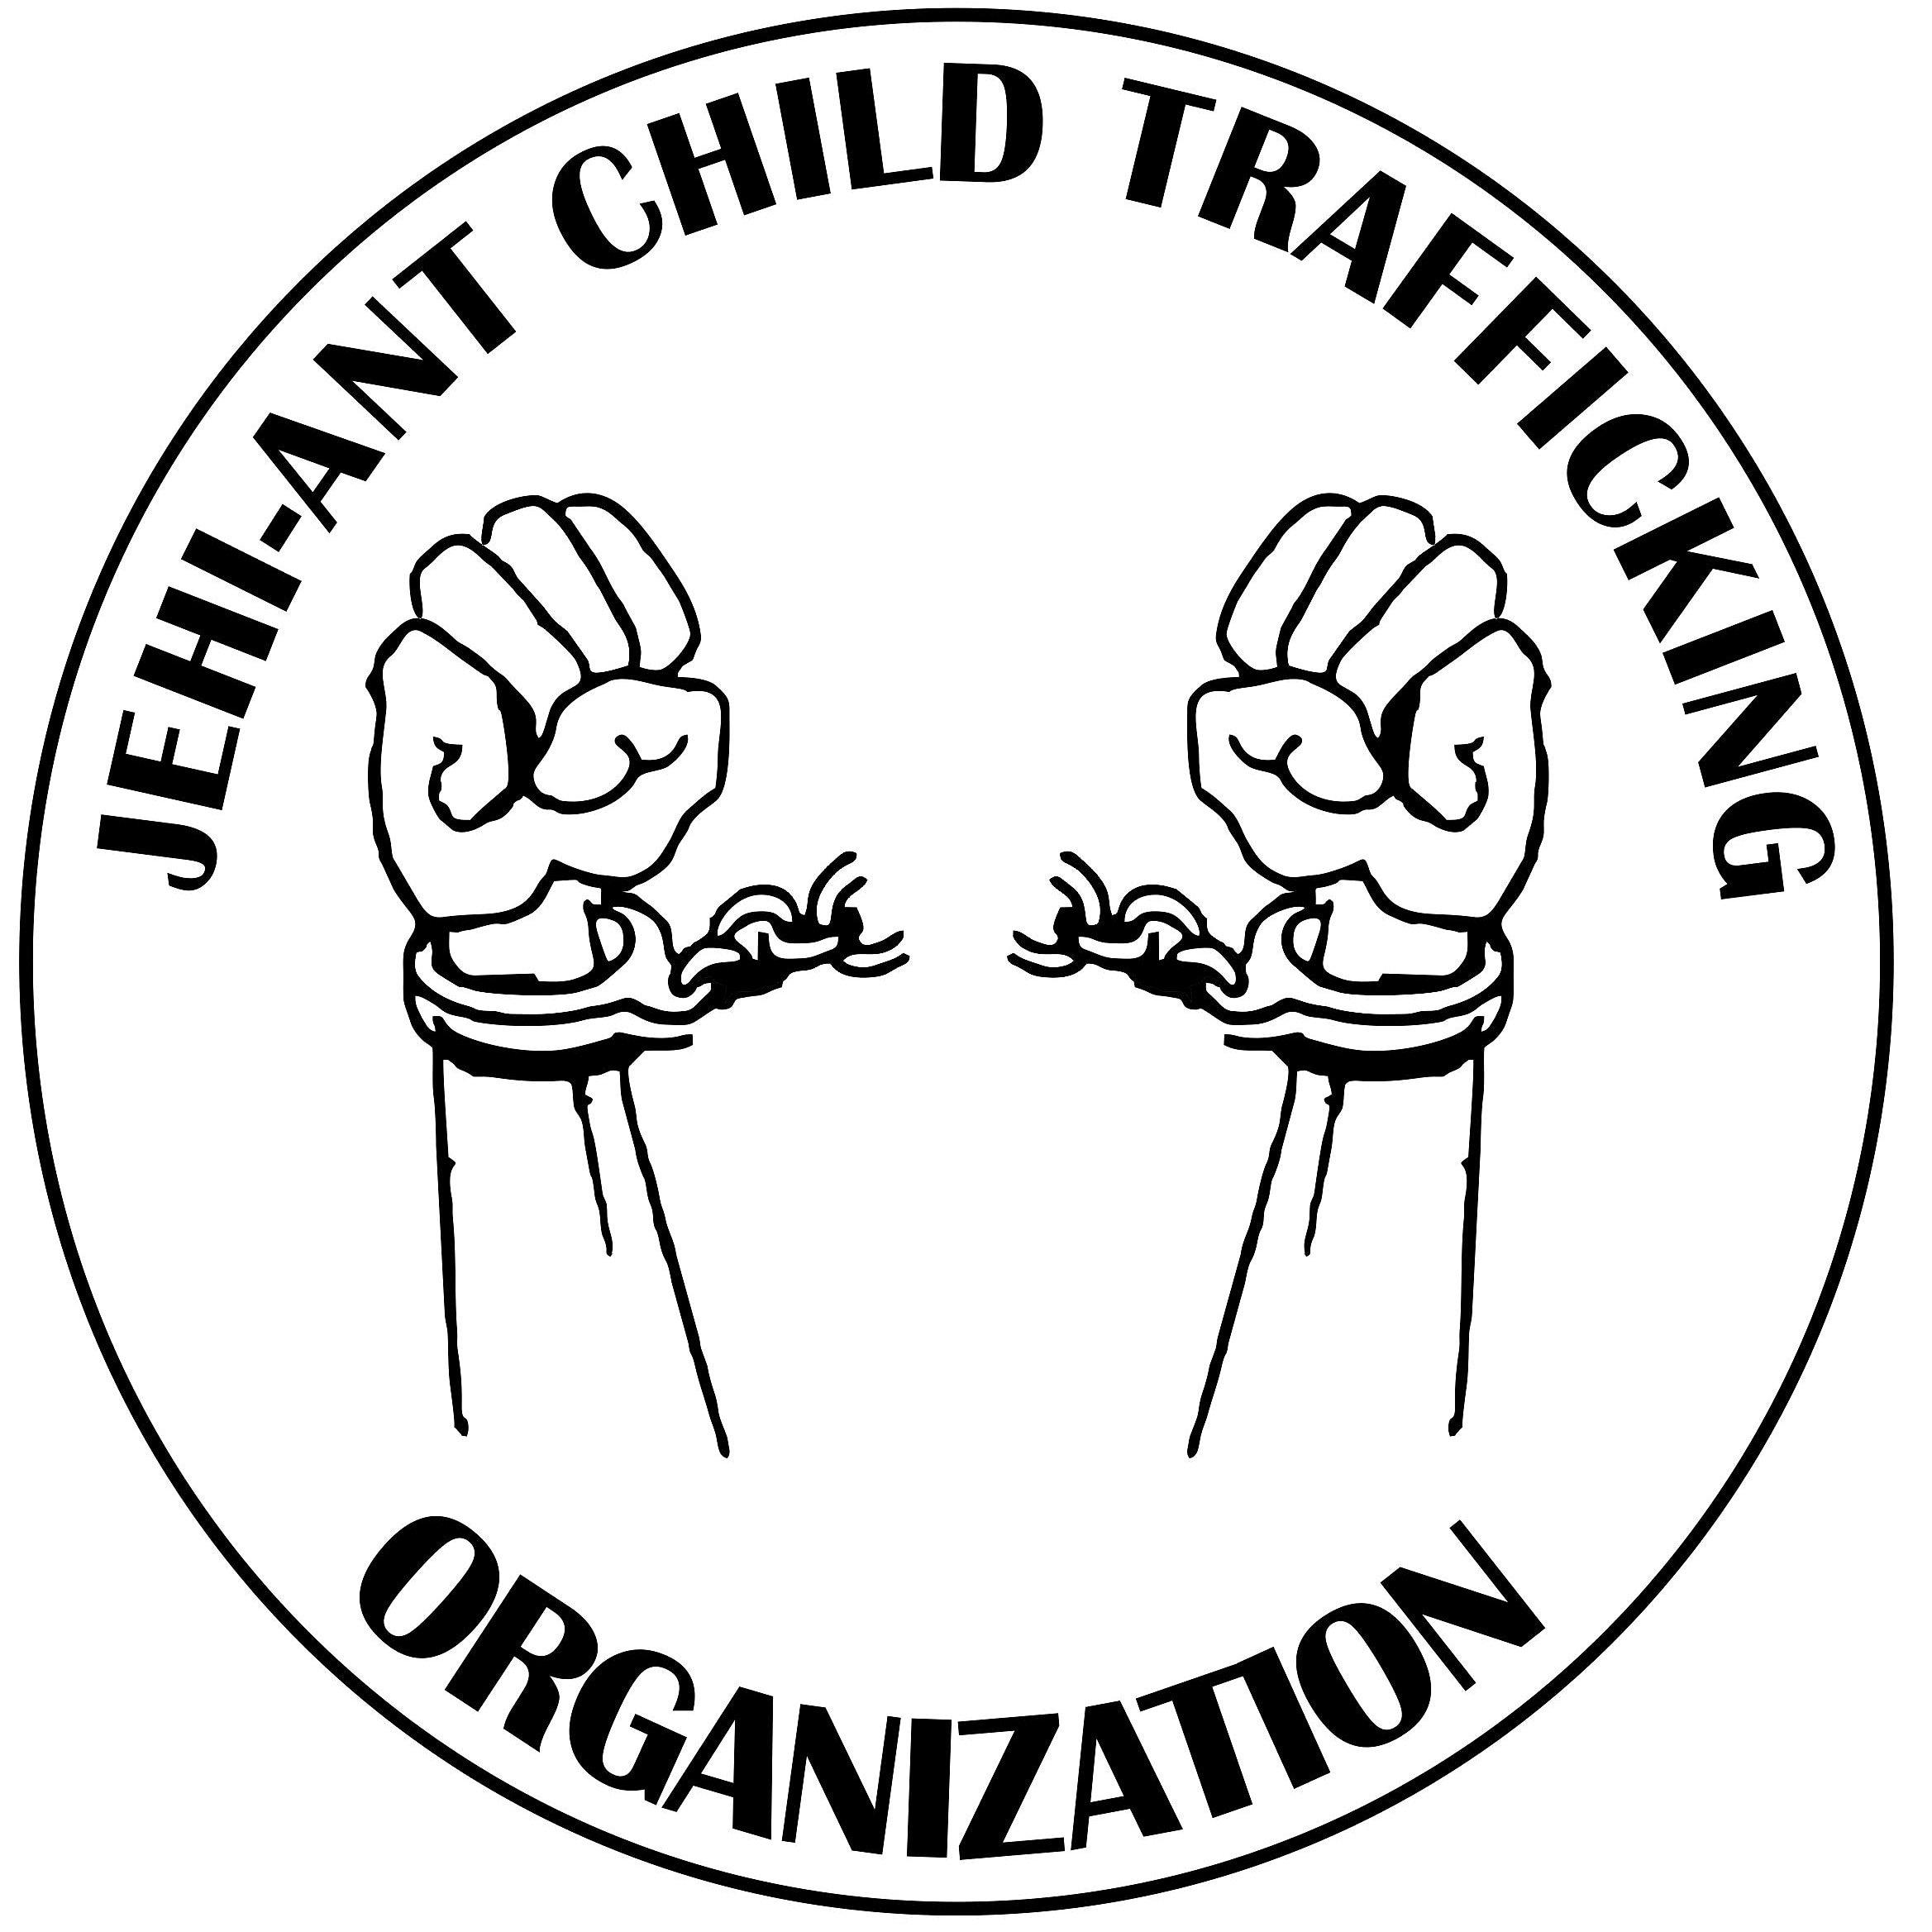 jehi ant child trafficking anization jehiant twitter  jehi ant child trafficking anization